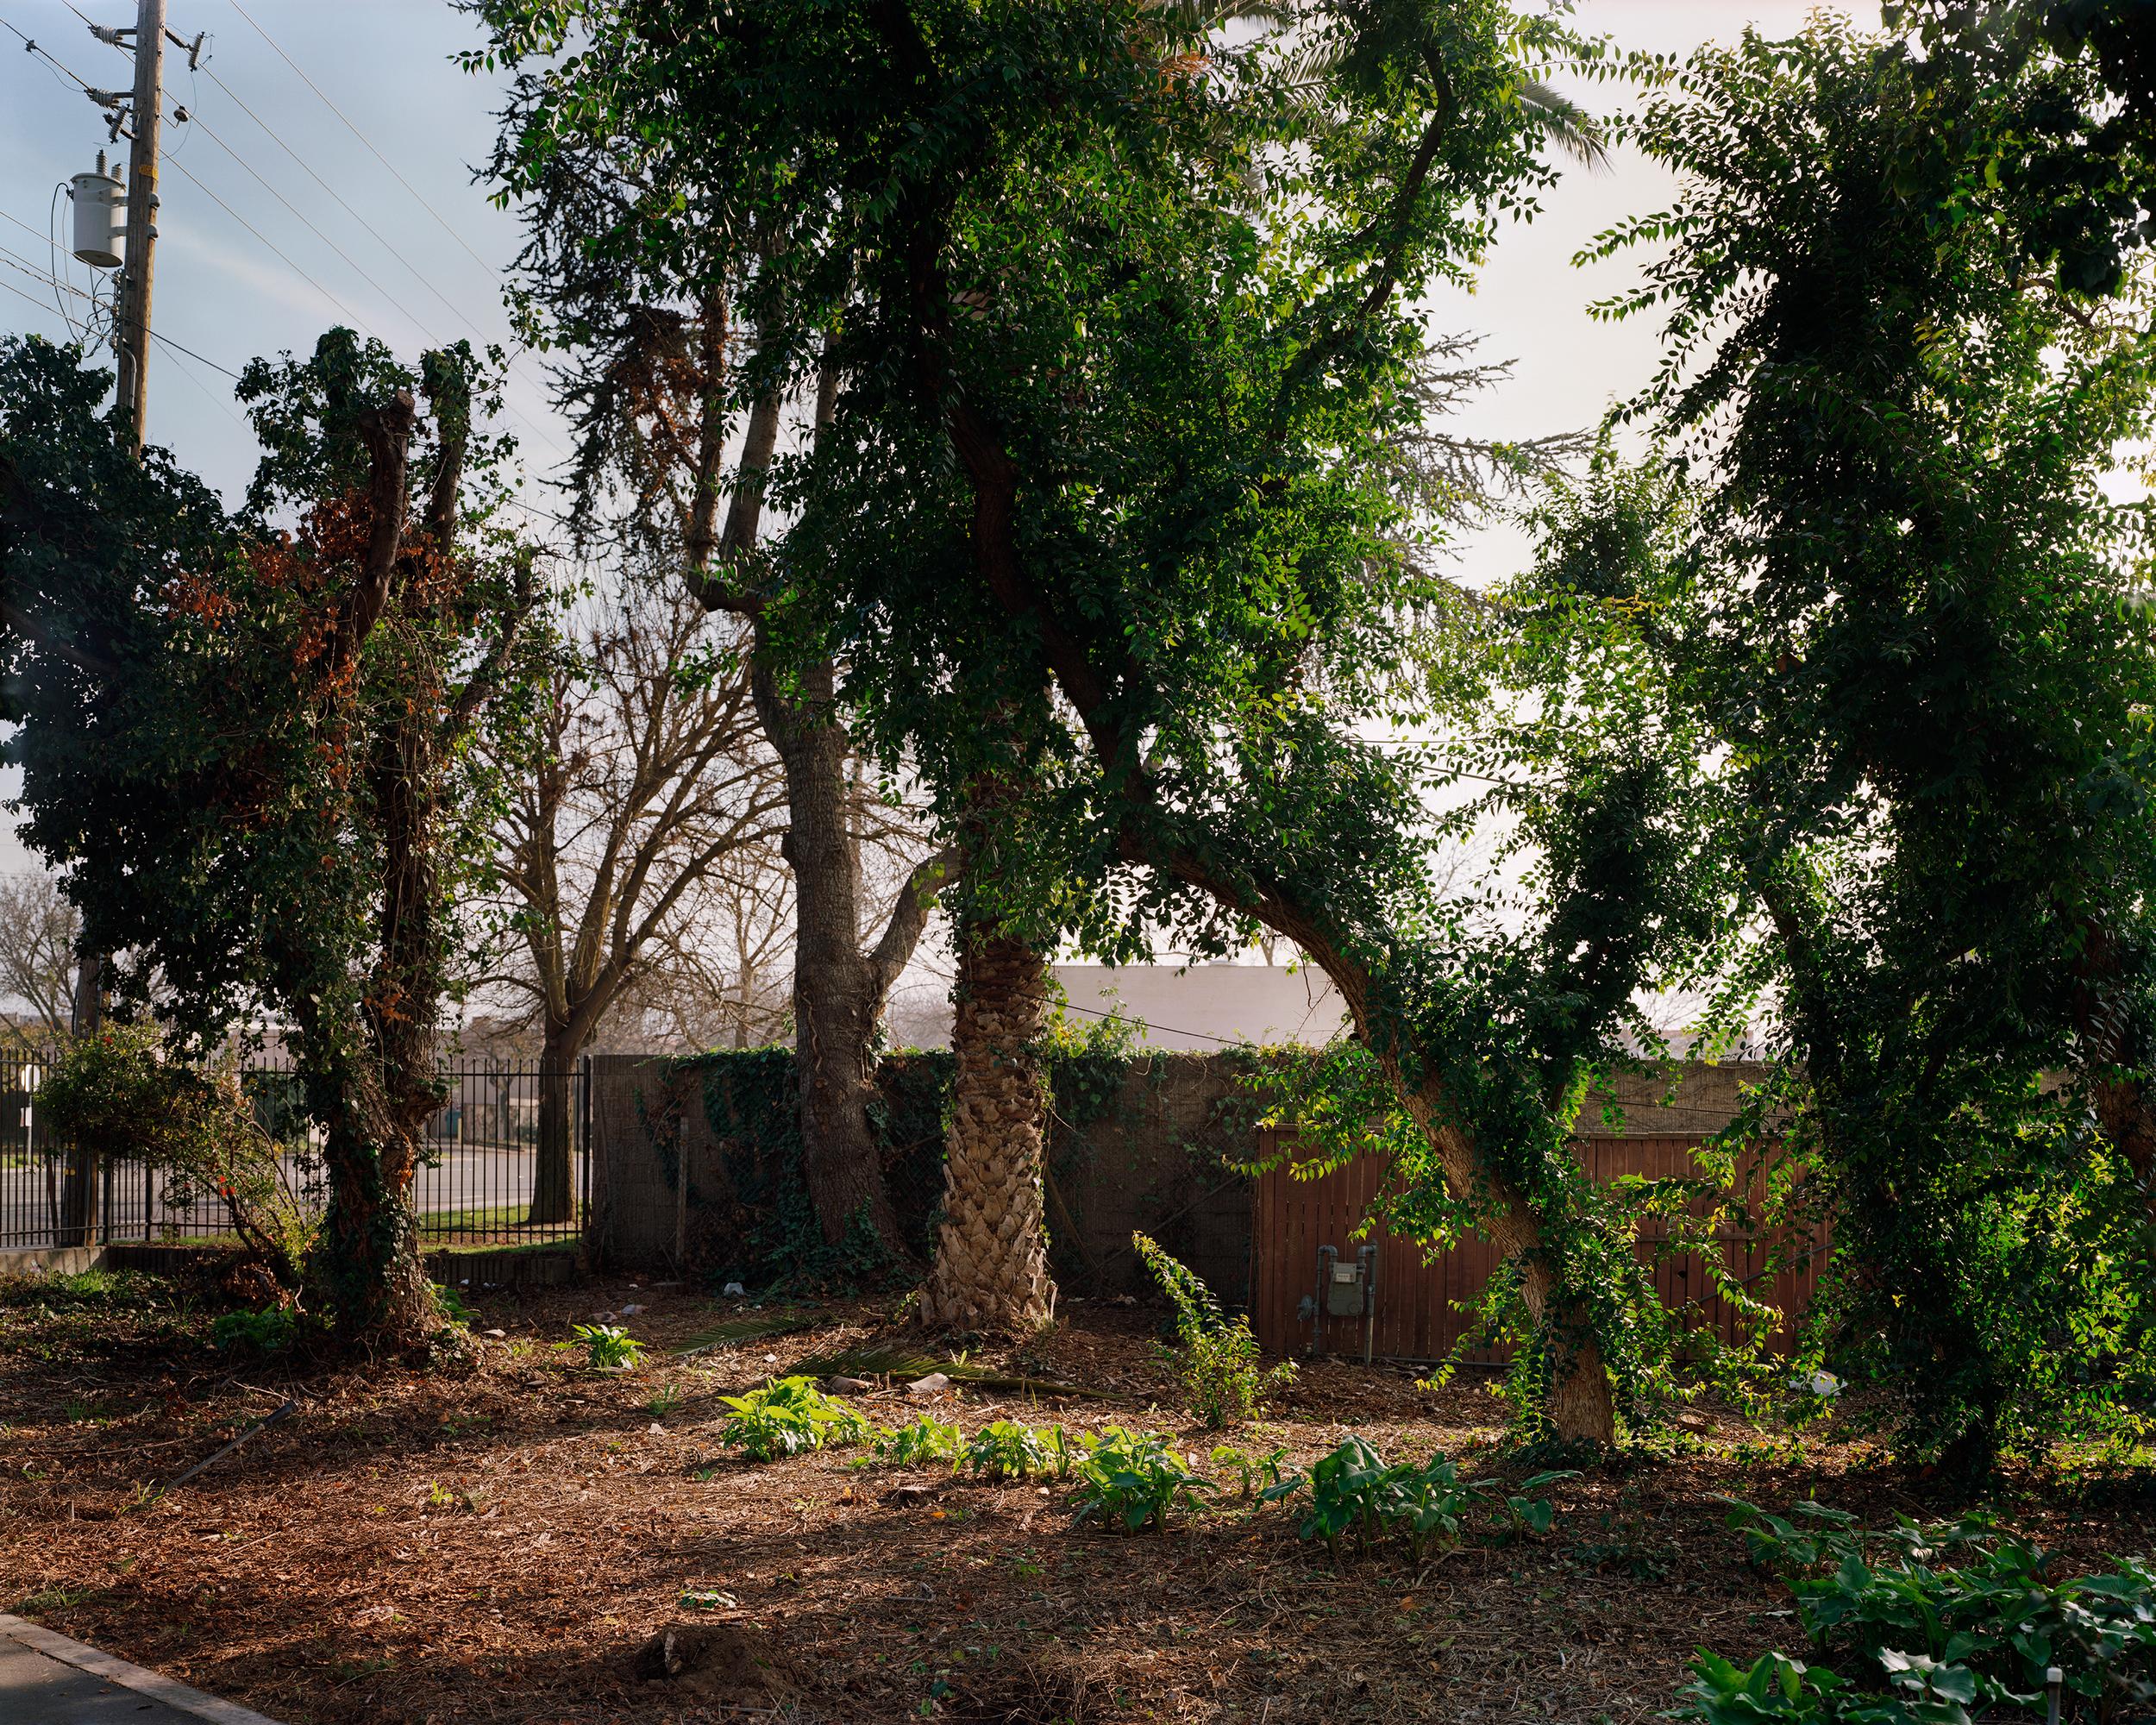 grannys trees book.jpg